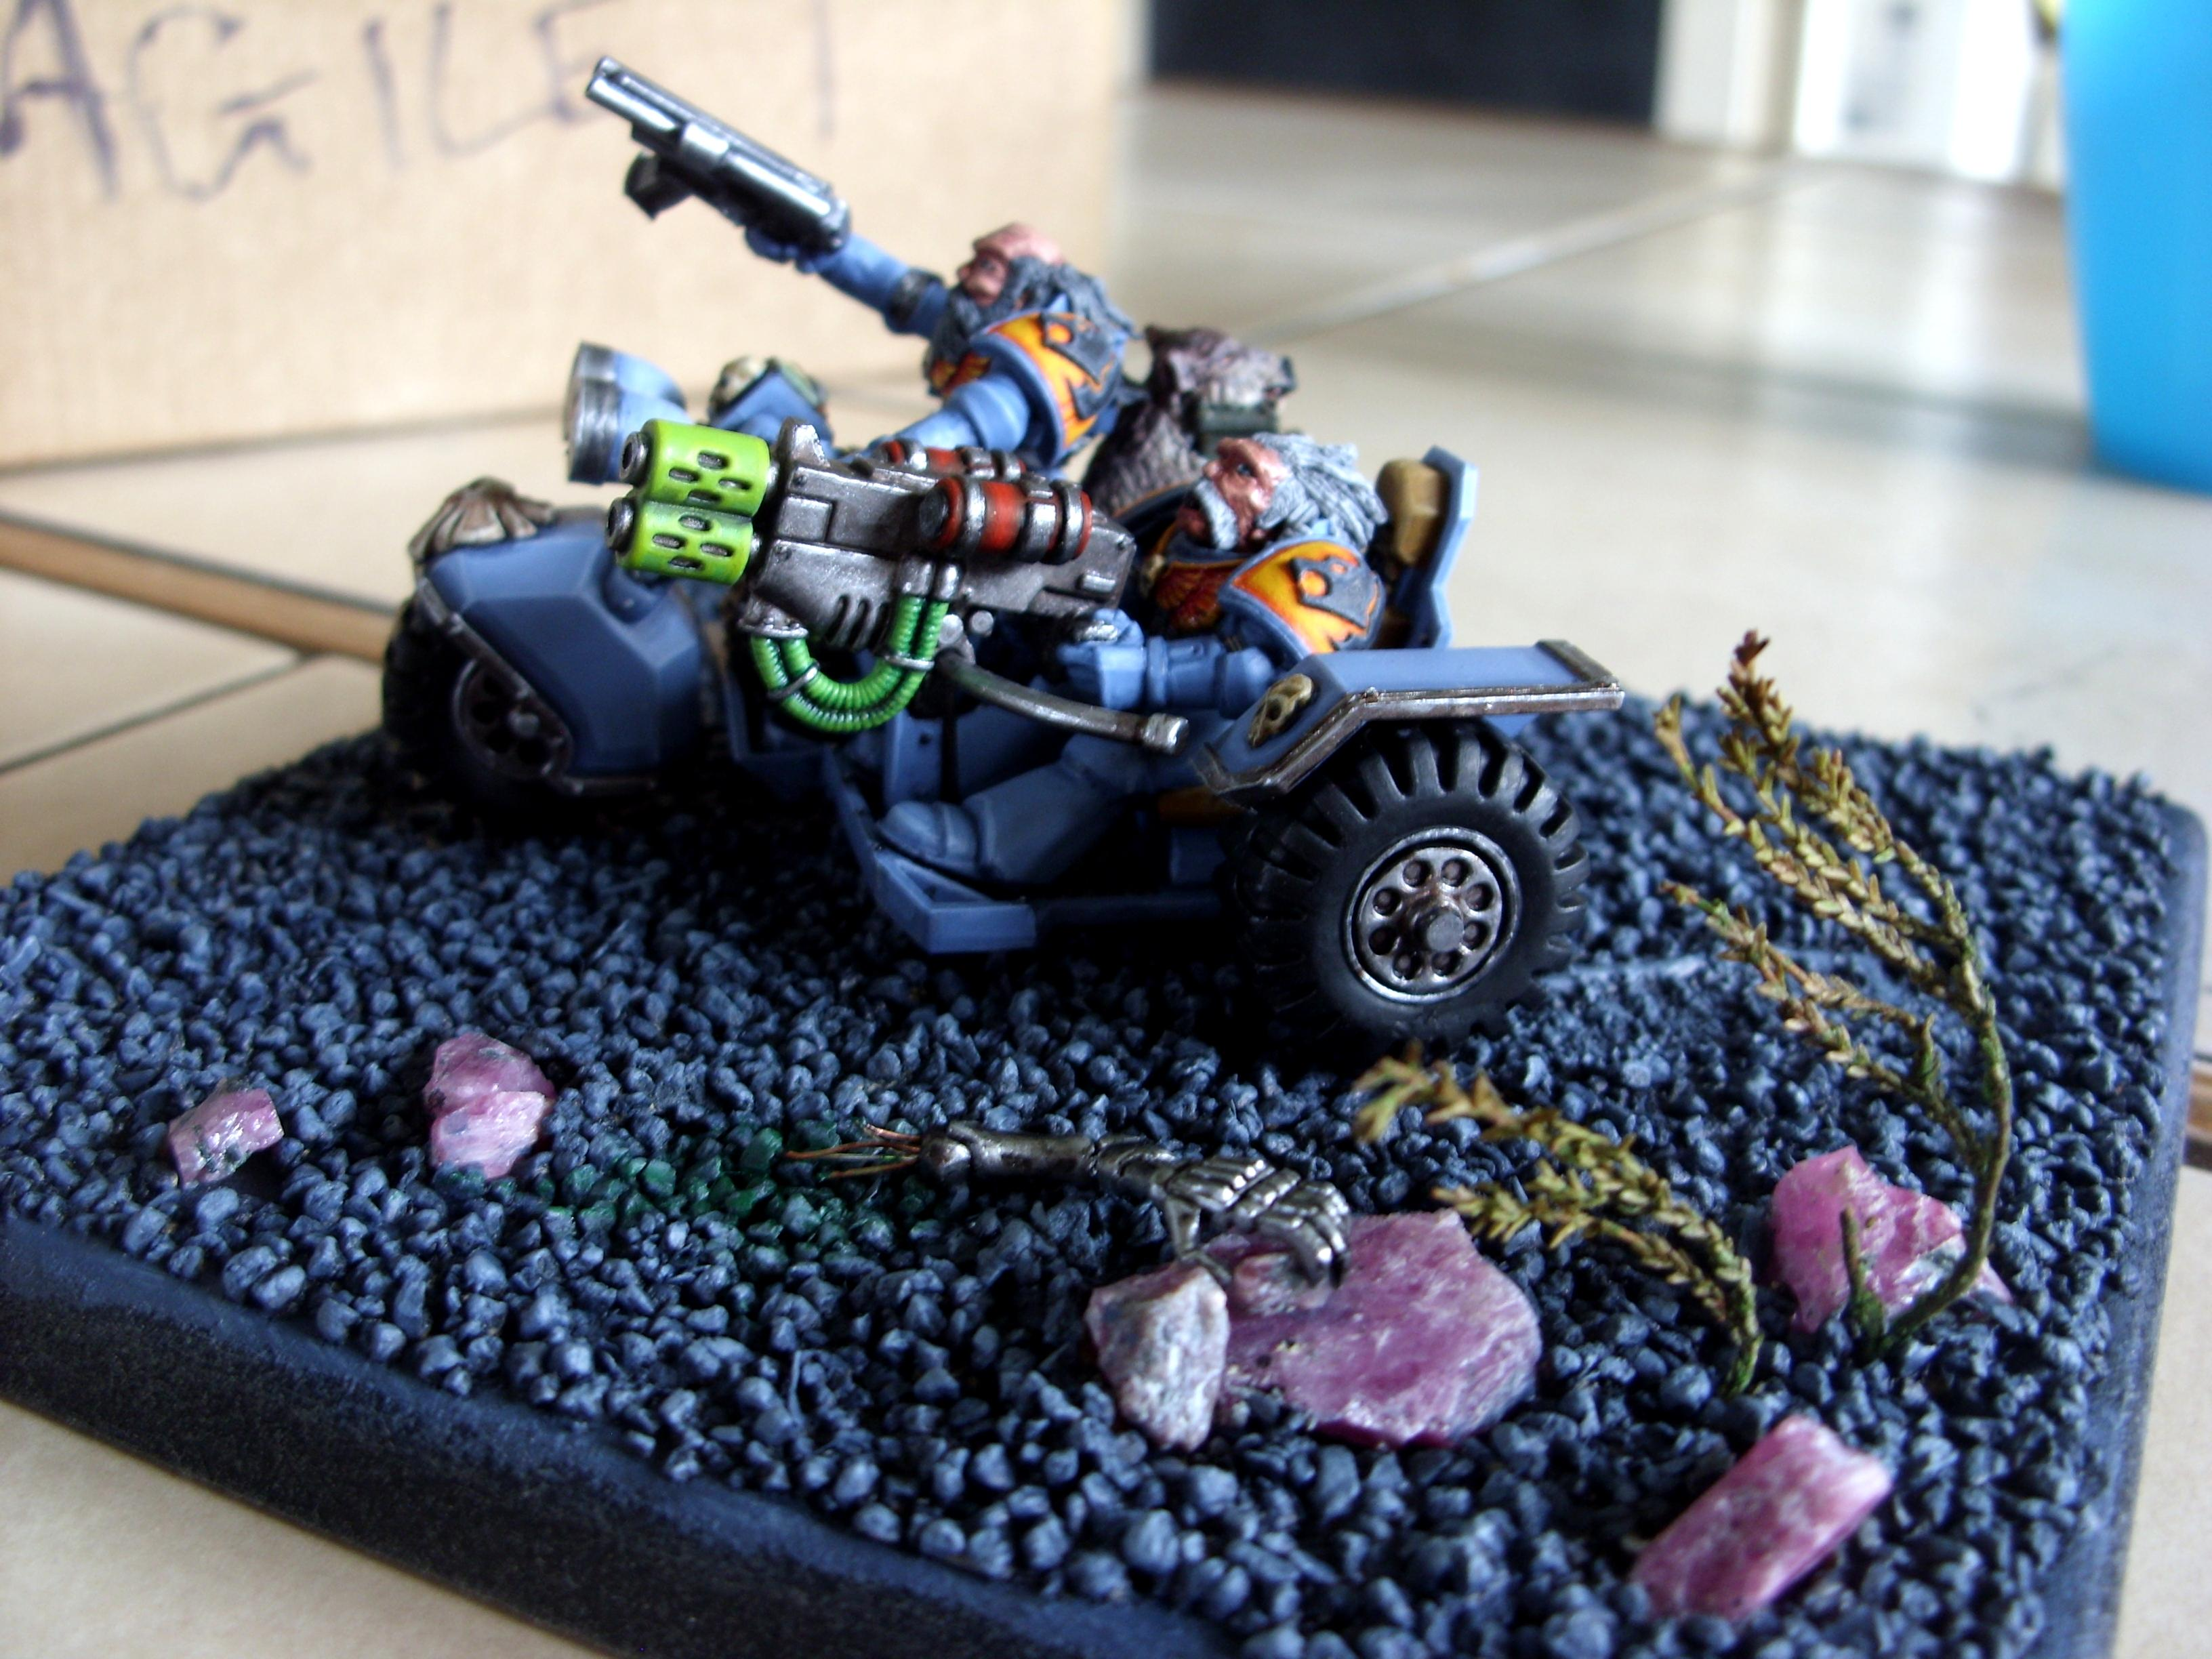 Bike, Conversion, Greenstuff, Space Marines, Space Wolves, Warhammer 40,000